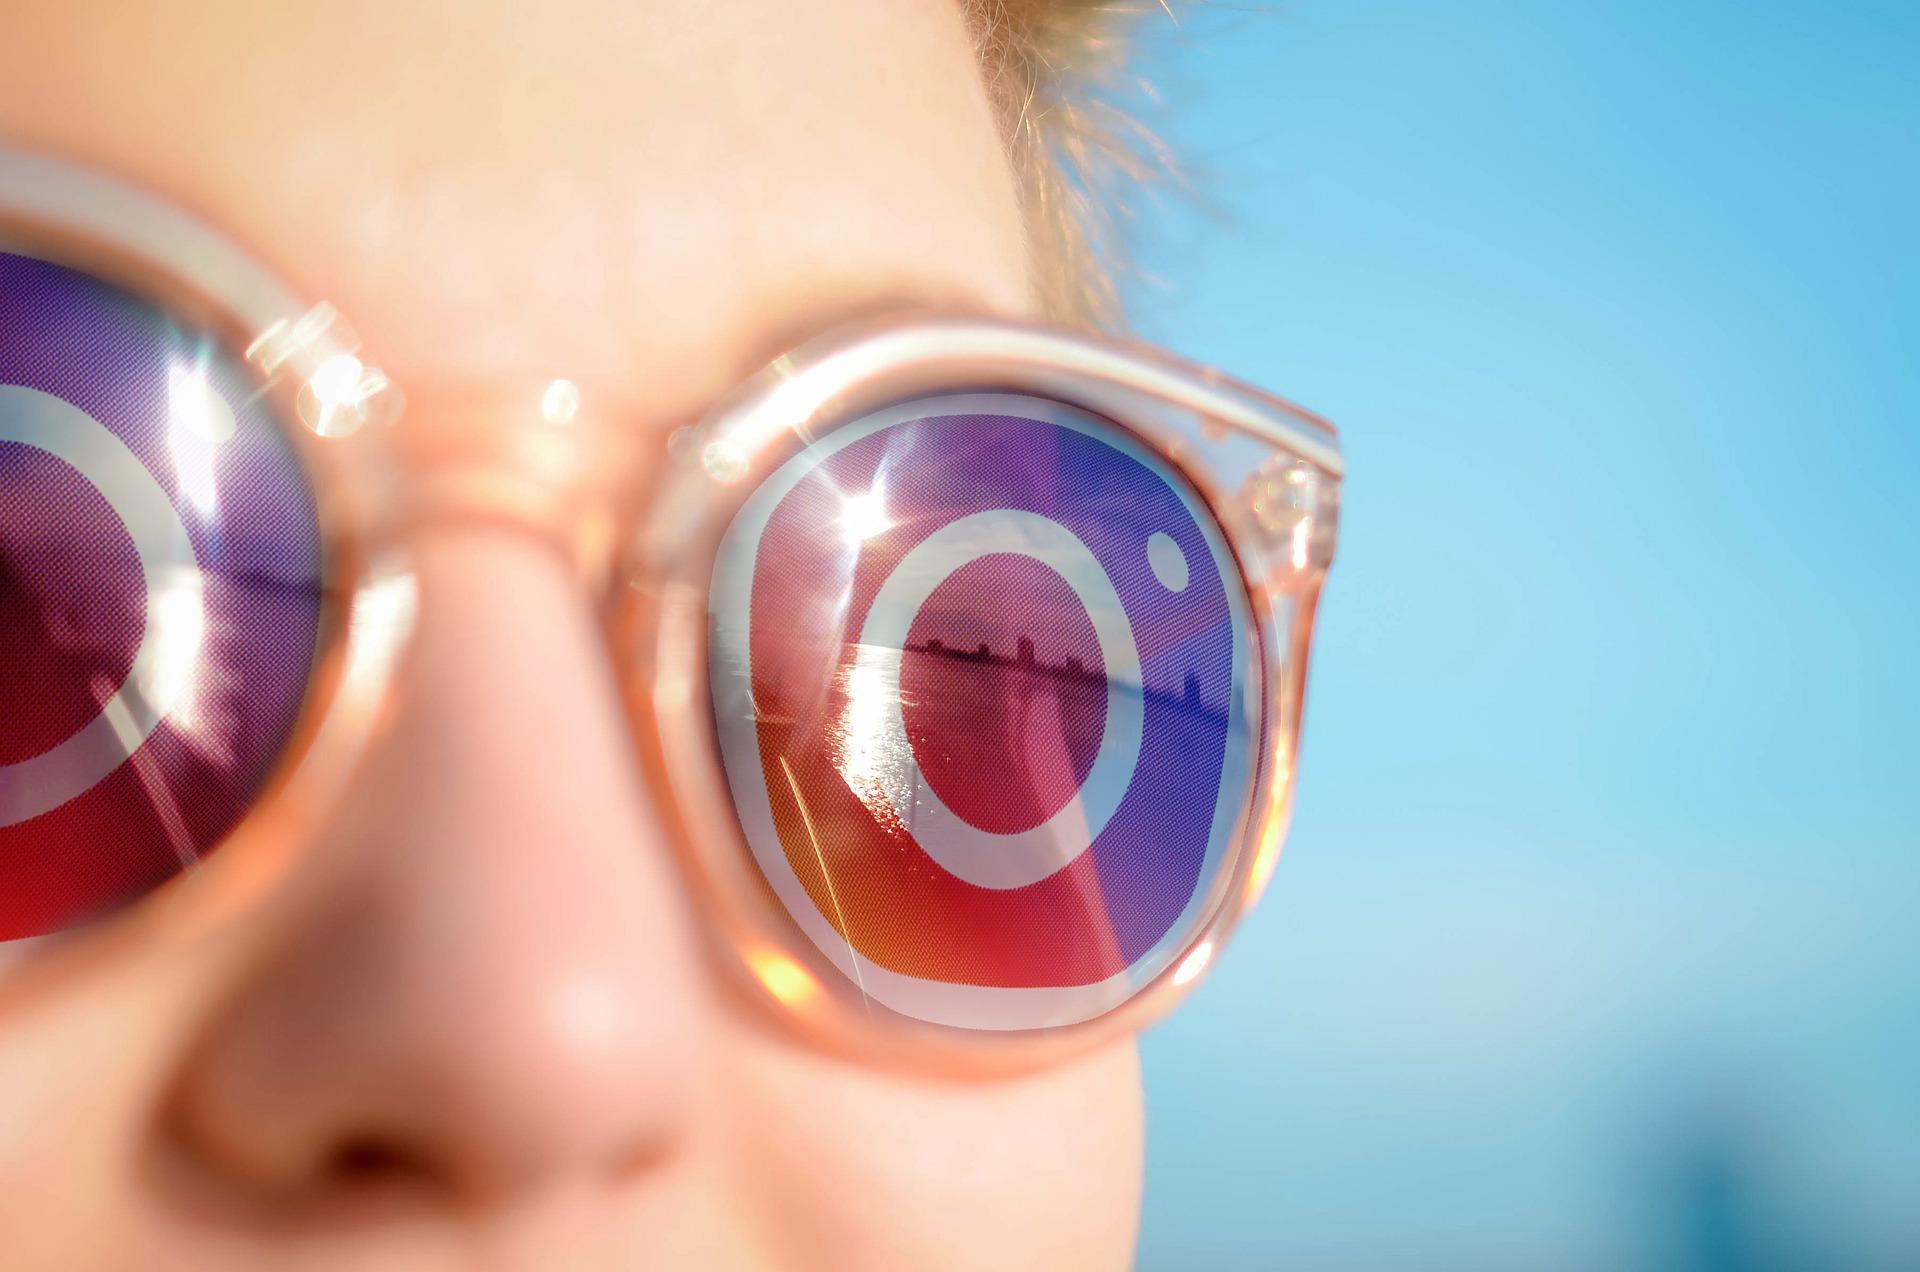 sunglasses-5559356_1920.jpg